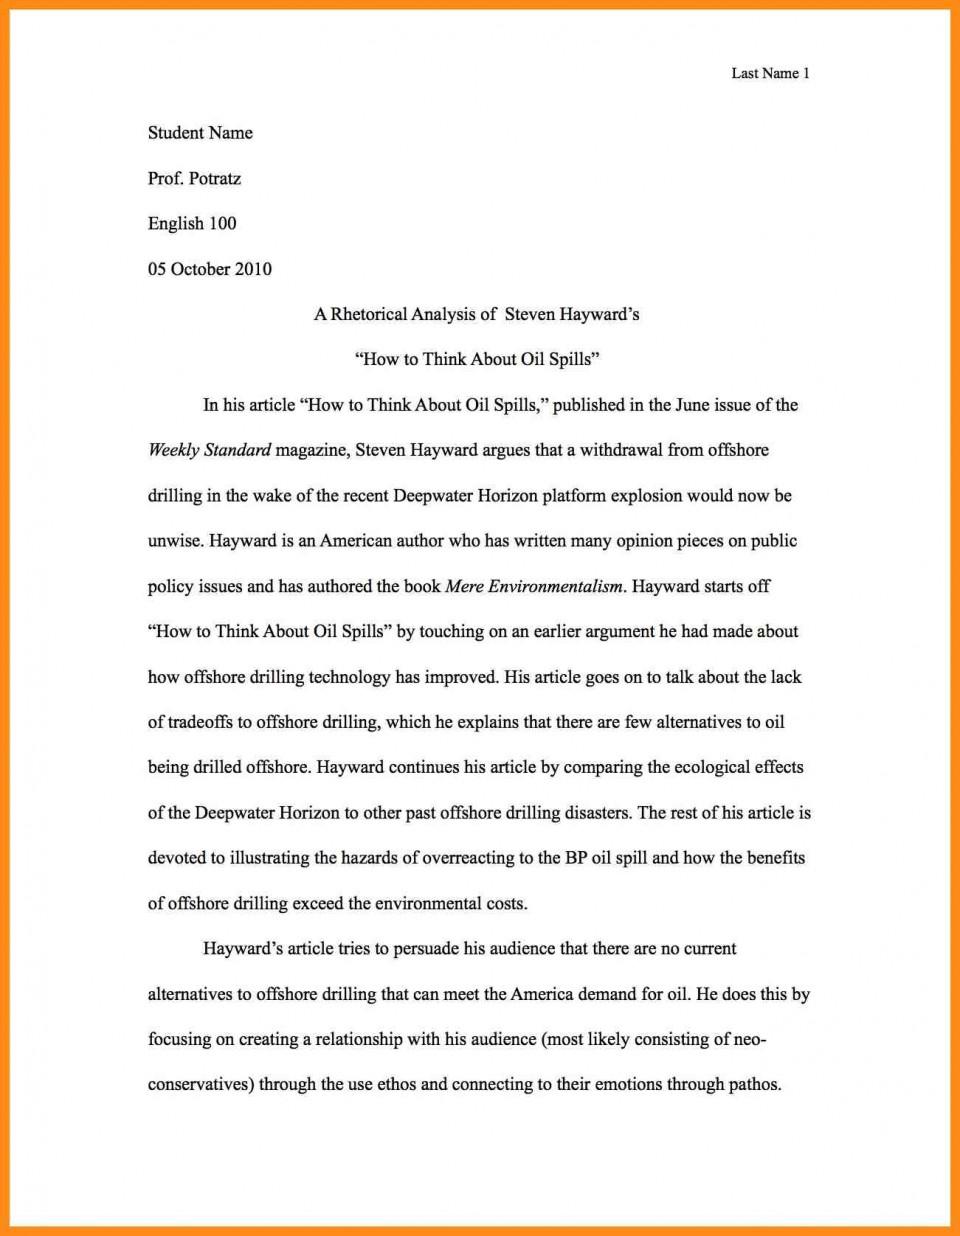 001 Write Best Rhetorical Analysis Essay Example Of Using Ethos Pathos And Logos Pdf Unusual Examples Ap Lang Mode 960